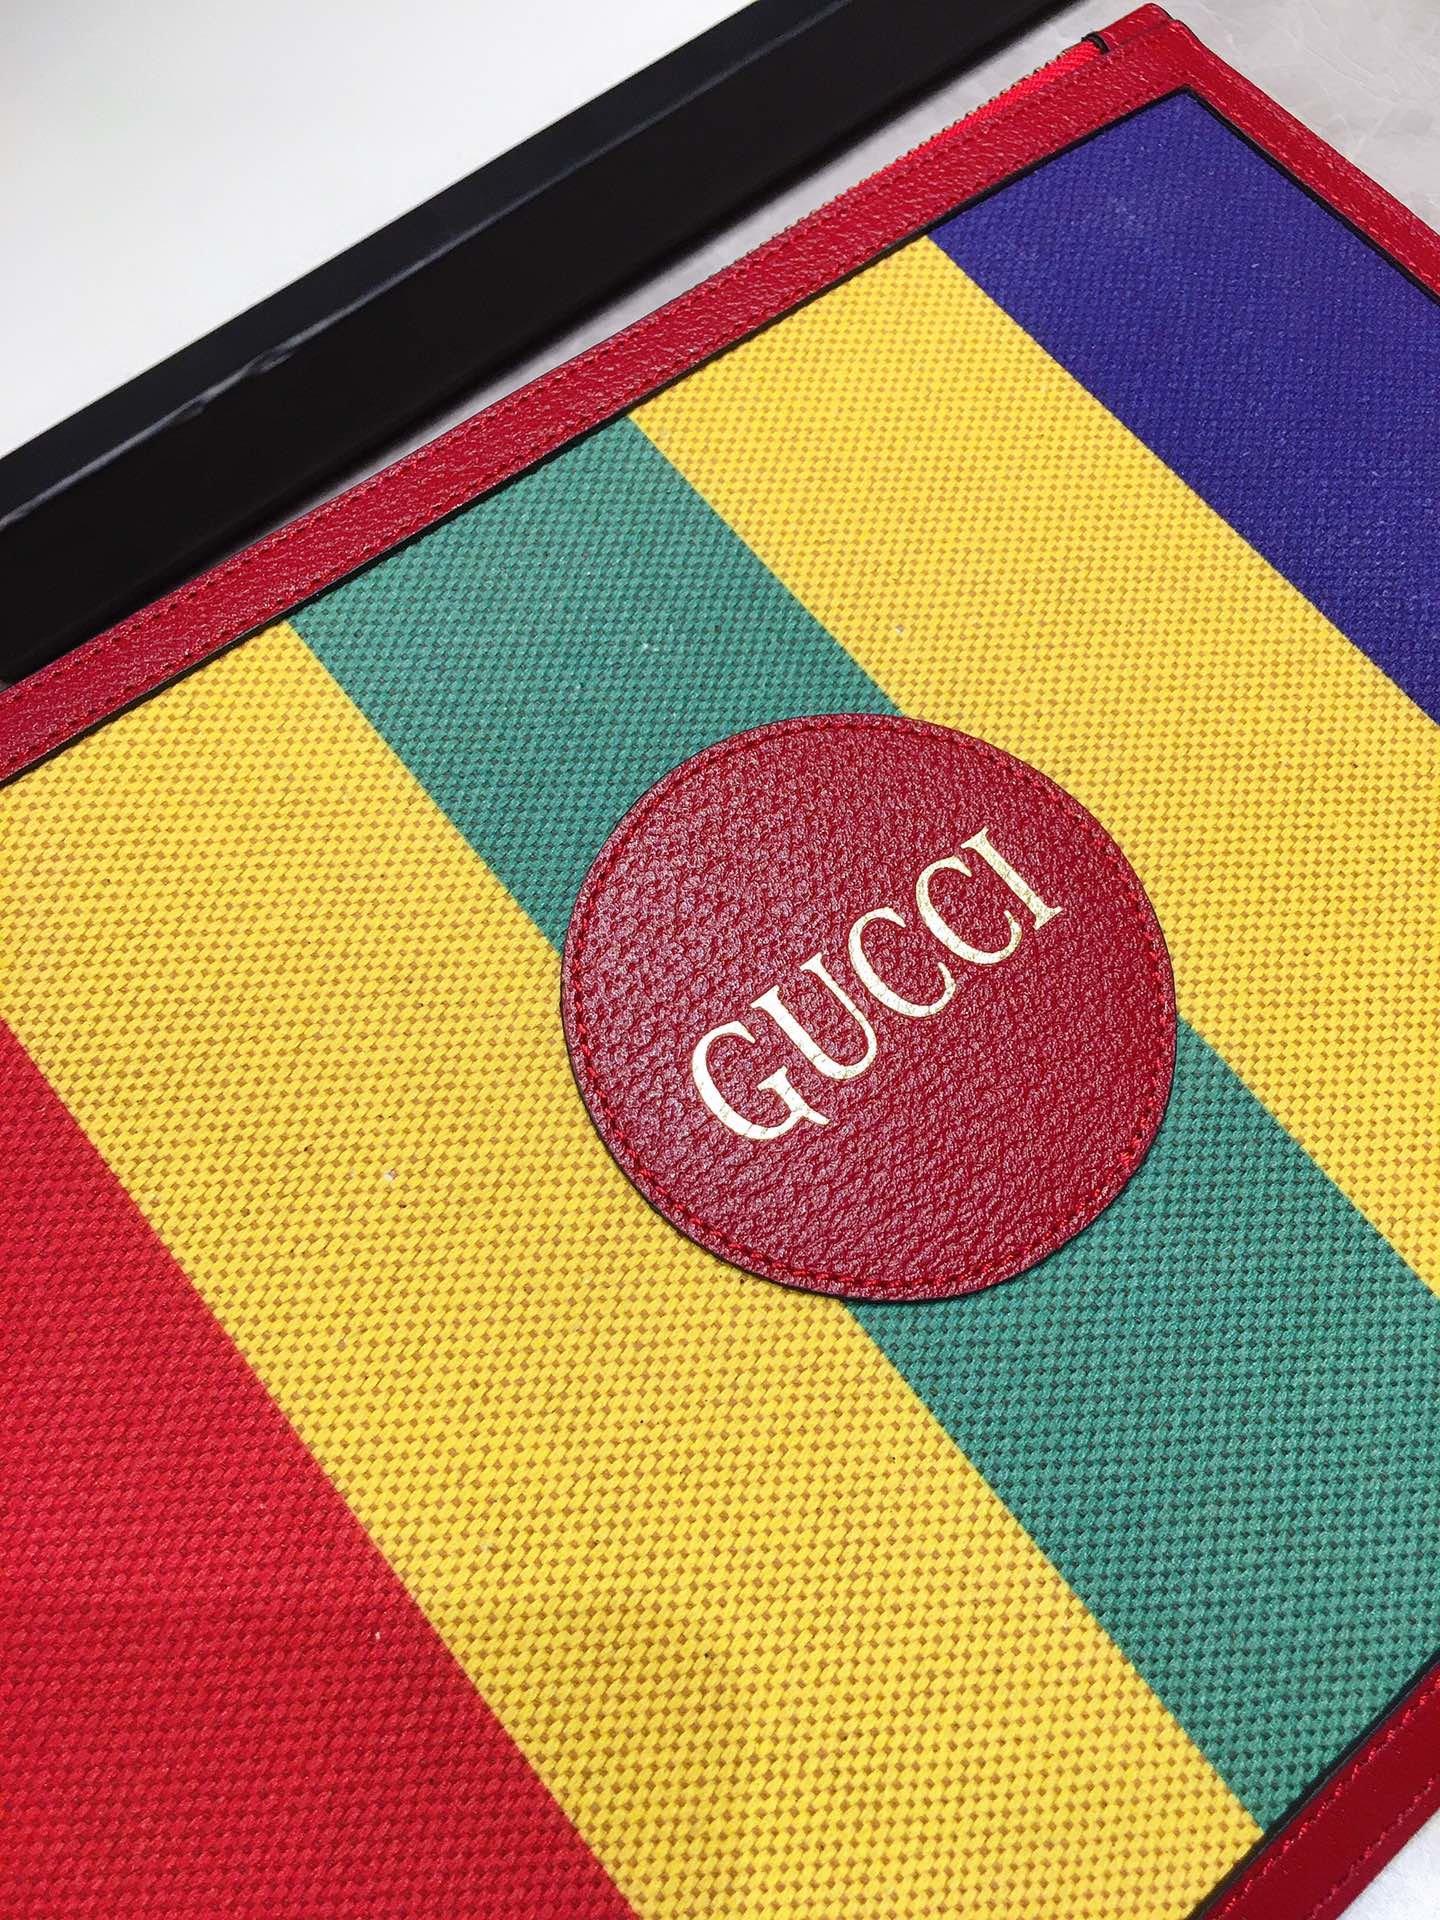 Gucci专柜同步上新 原单出品 Baiadera宽条纹帆布手拿包 (图3)